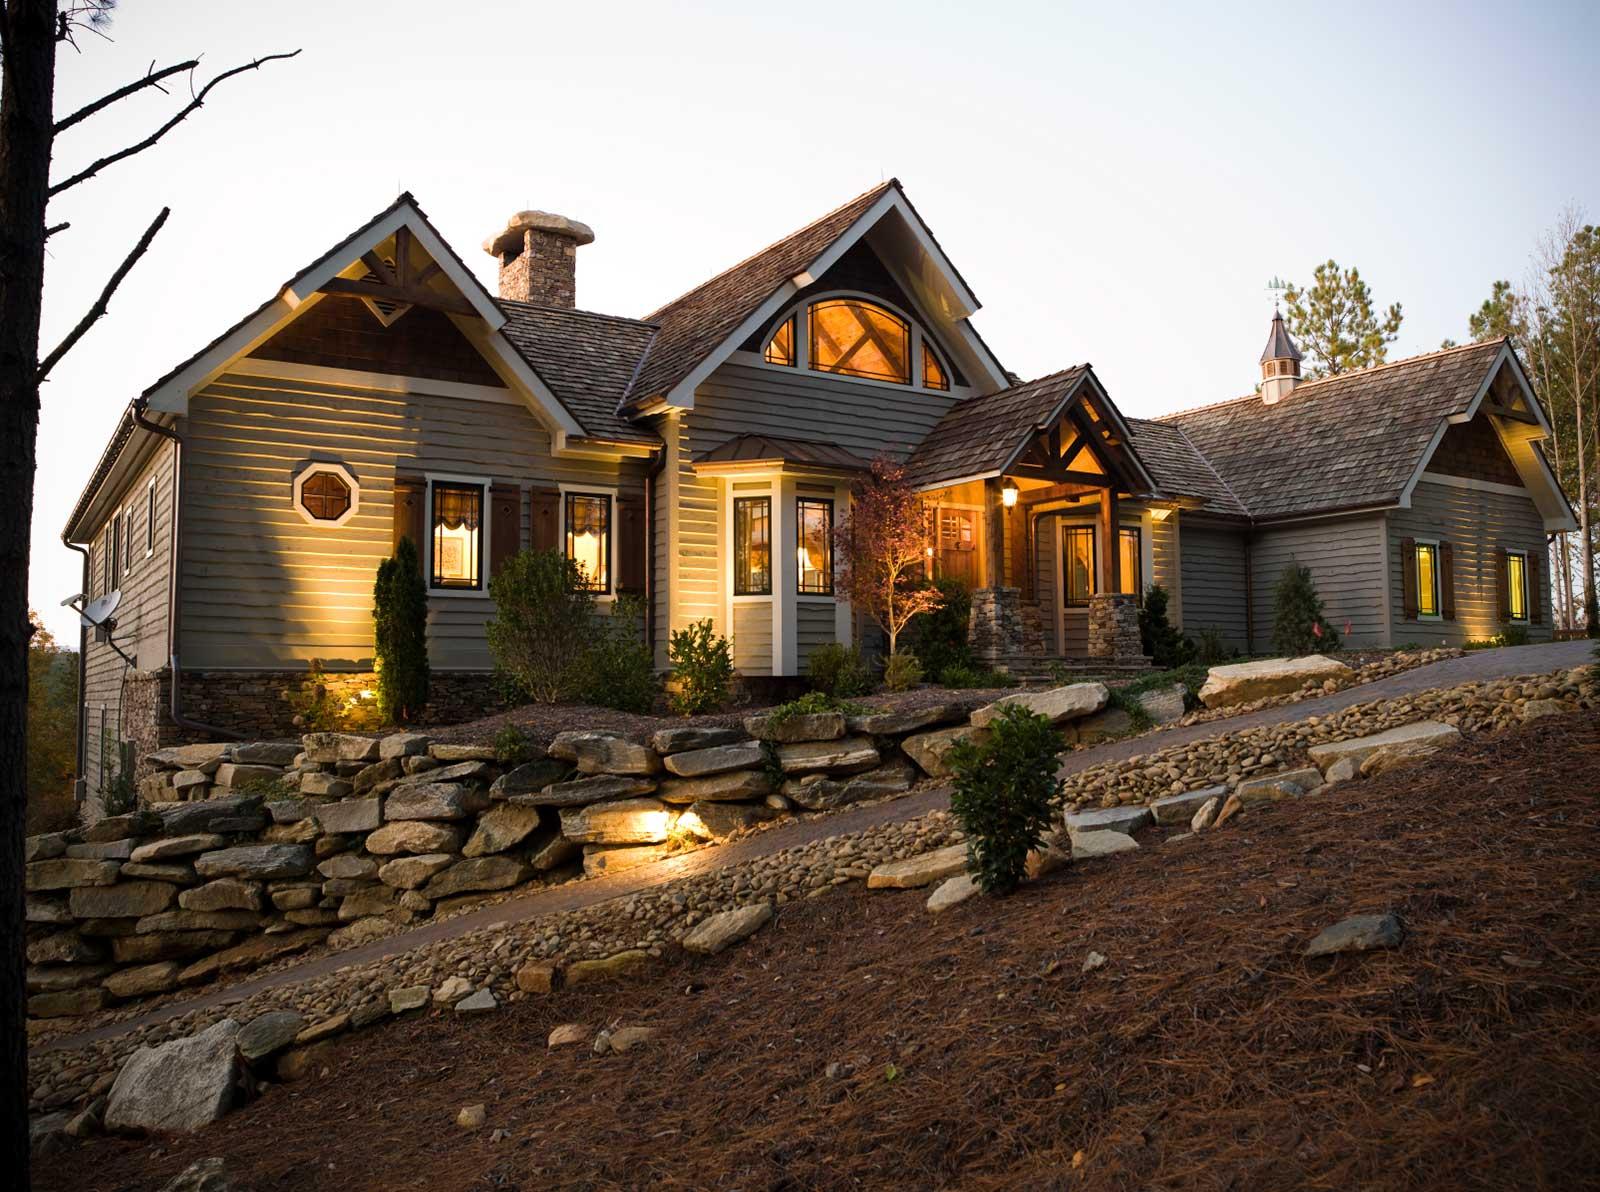 North carolina custom home contractor builder jcm for Custom home builders chattanooga tn